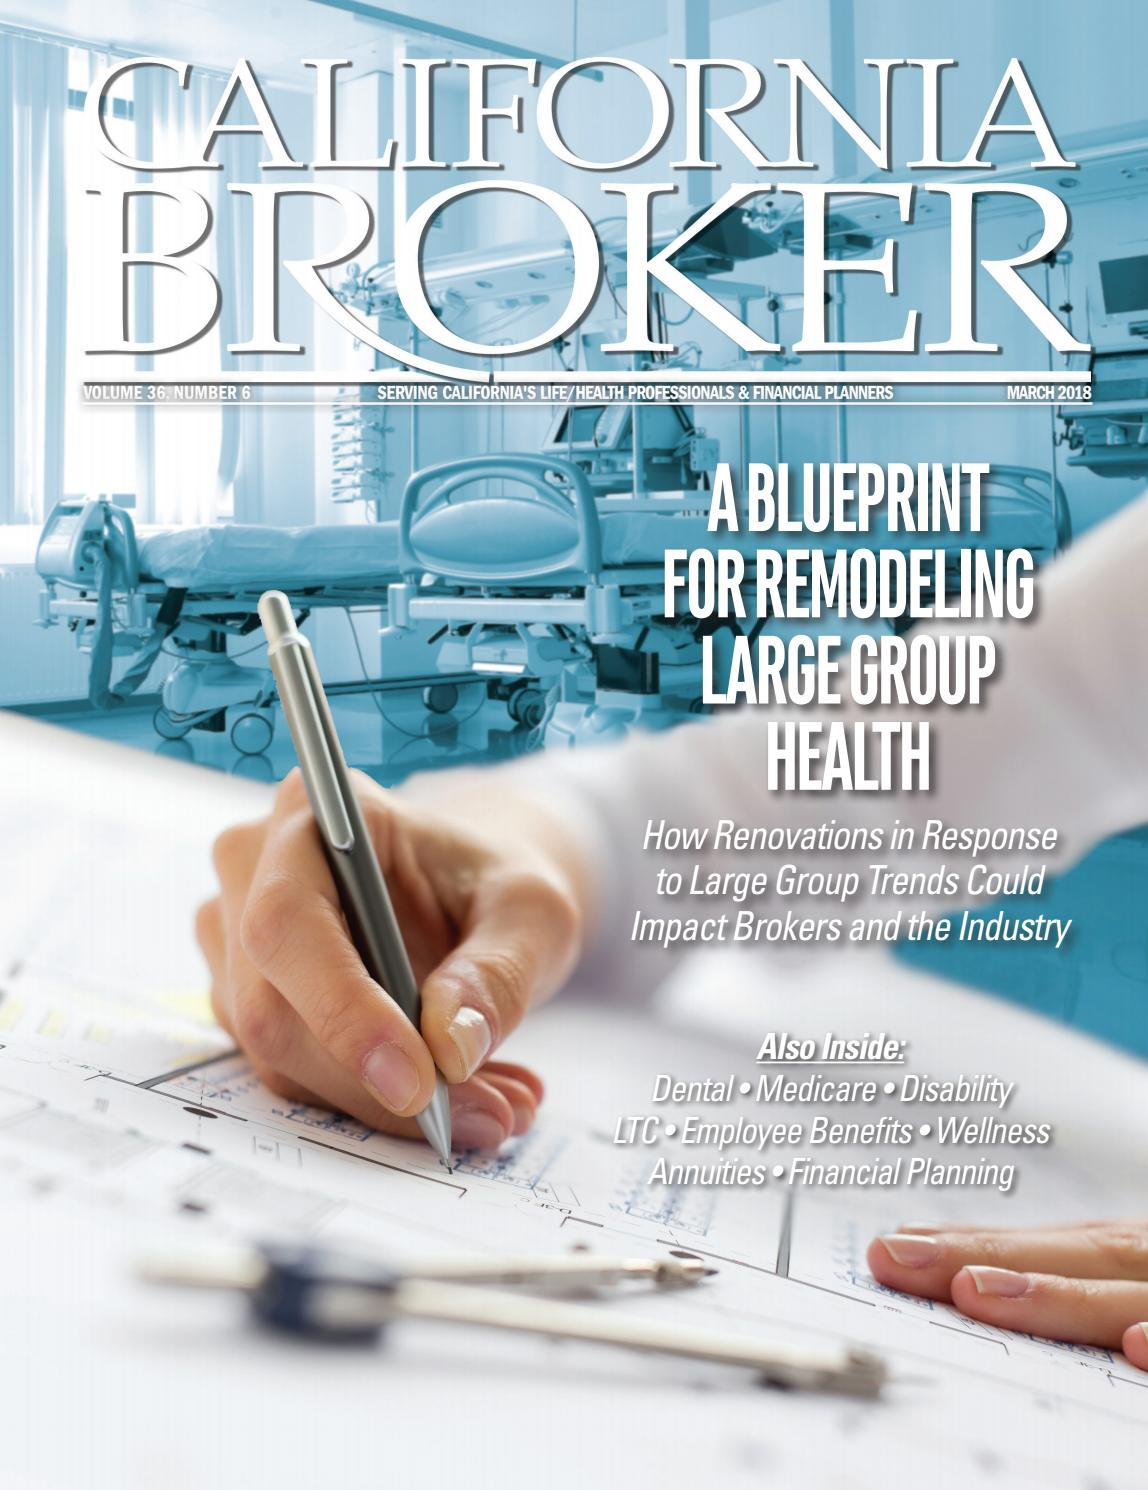 California broker march 2018 by california broker magazine issuu malvernweather Choice Image